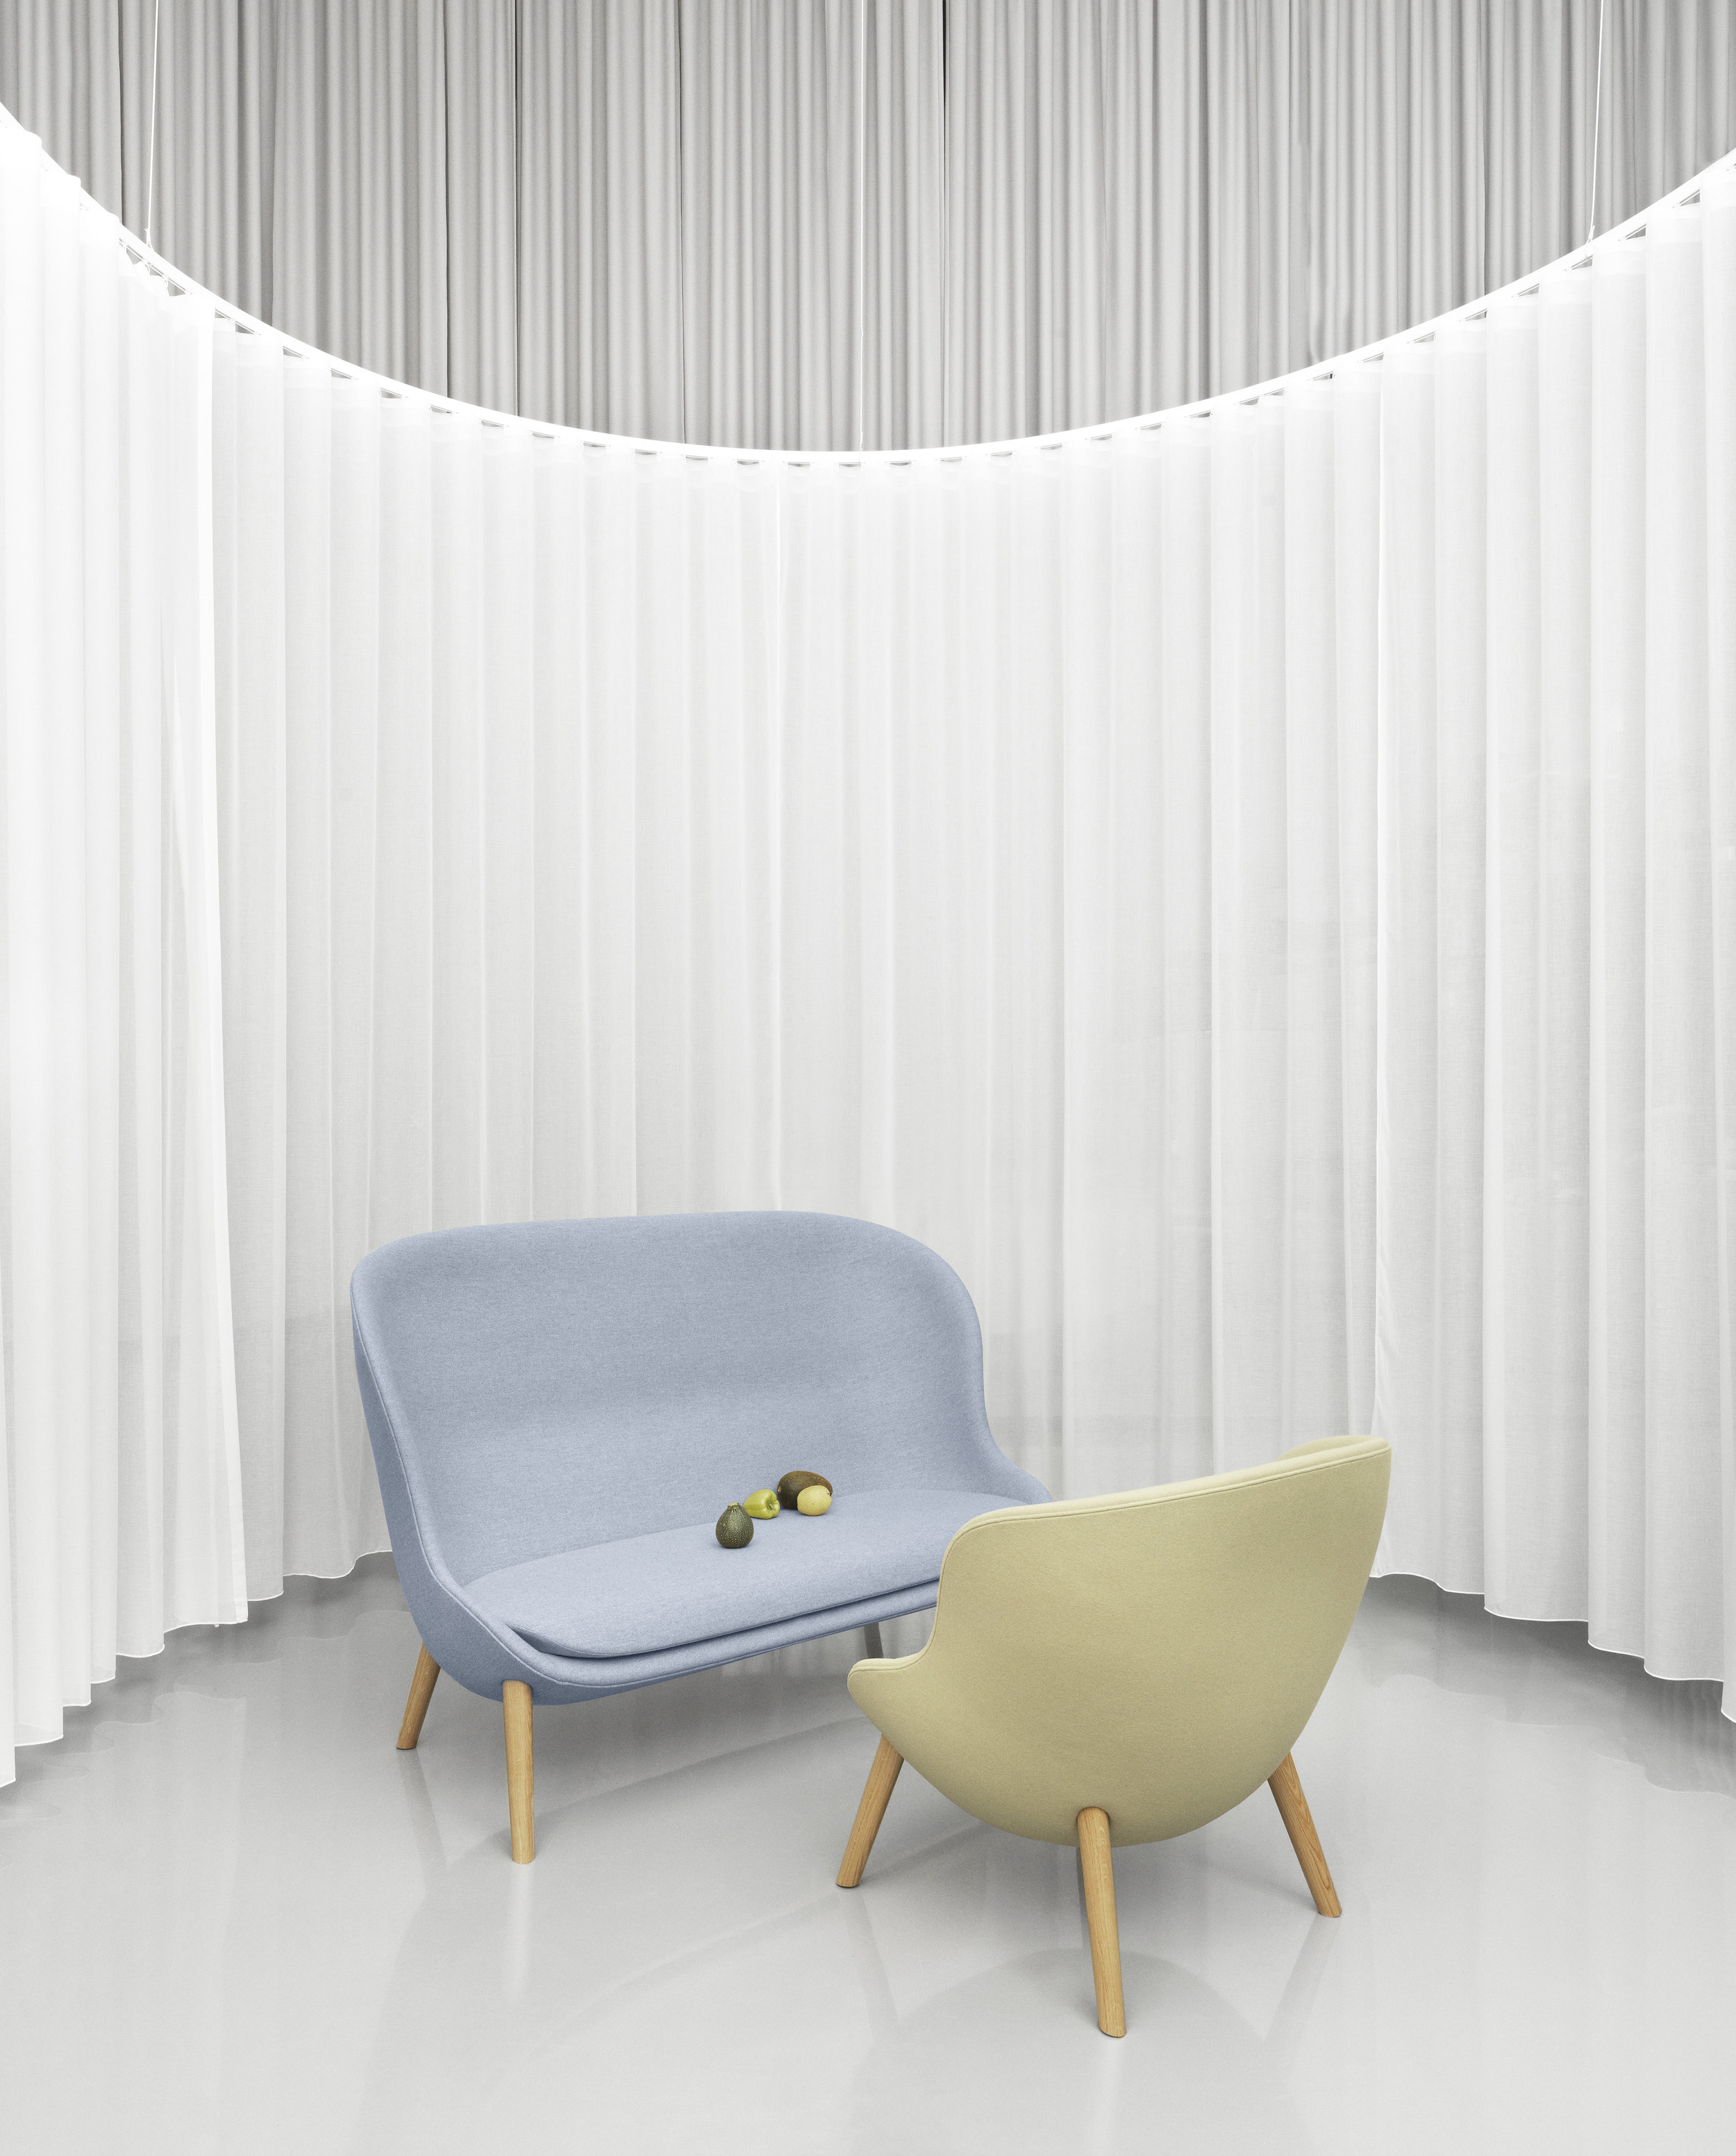 norman copenhagen hug lounge chair living scandinavian home inspiration.jpg